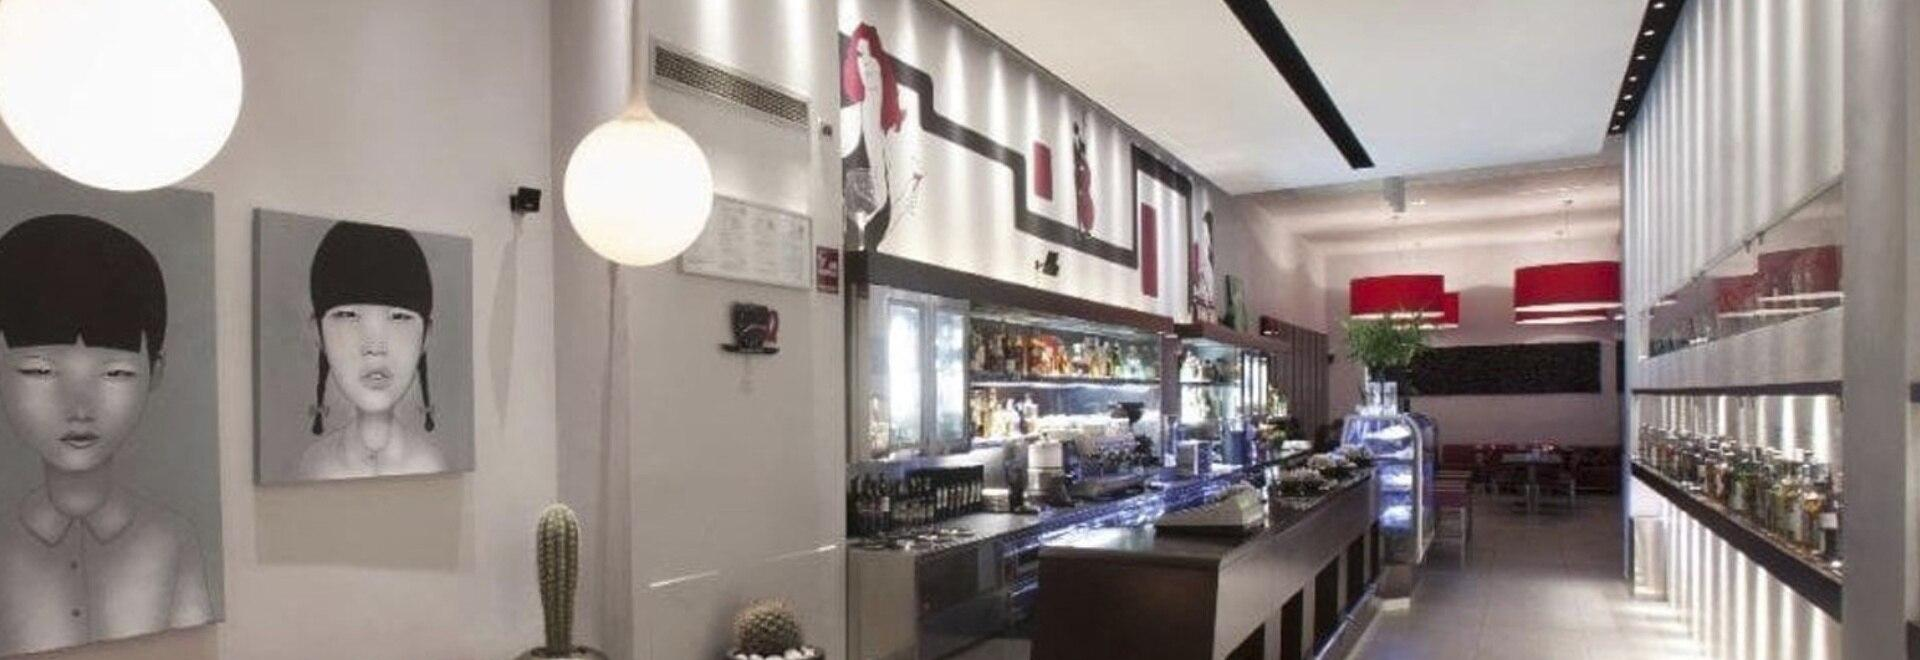 Bar d'Italia